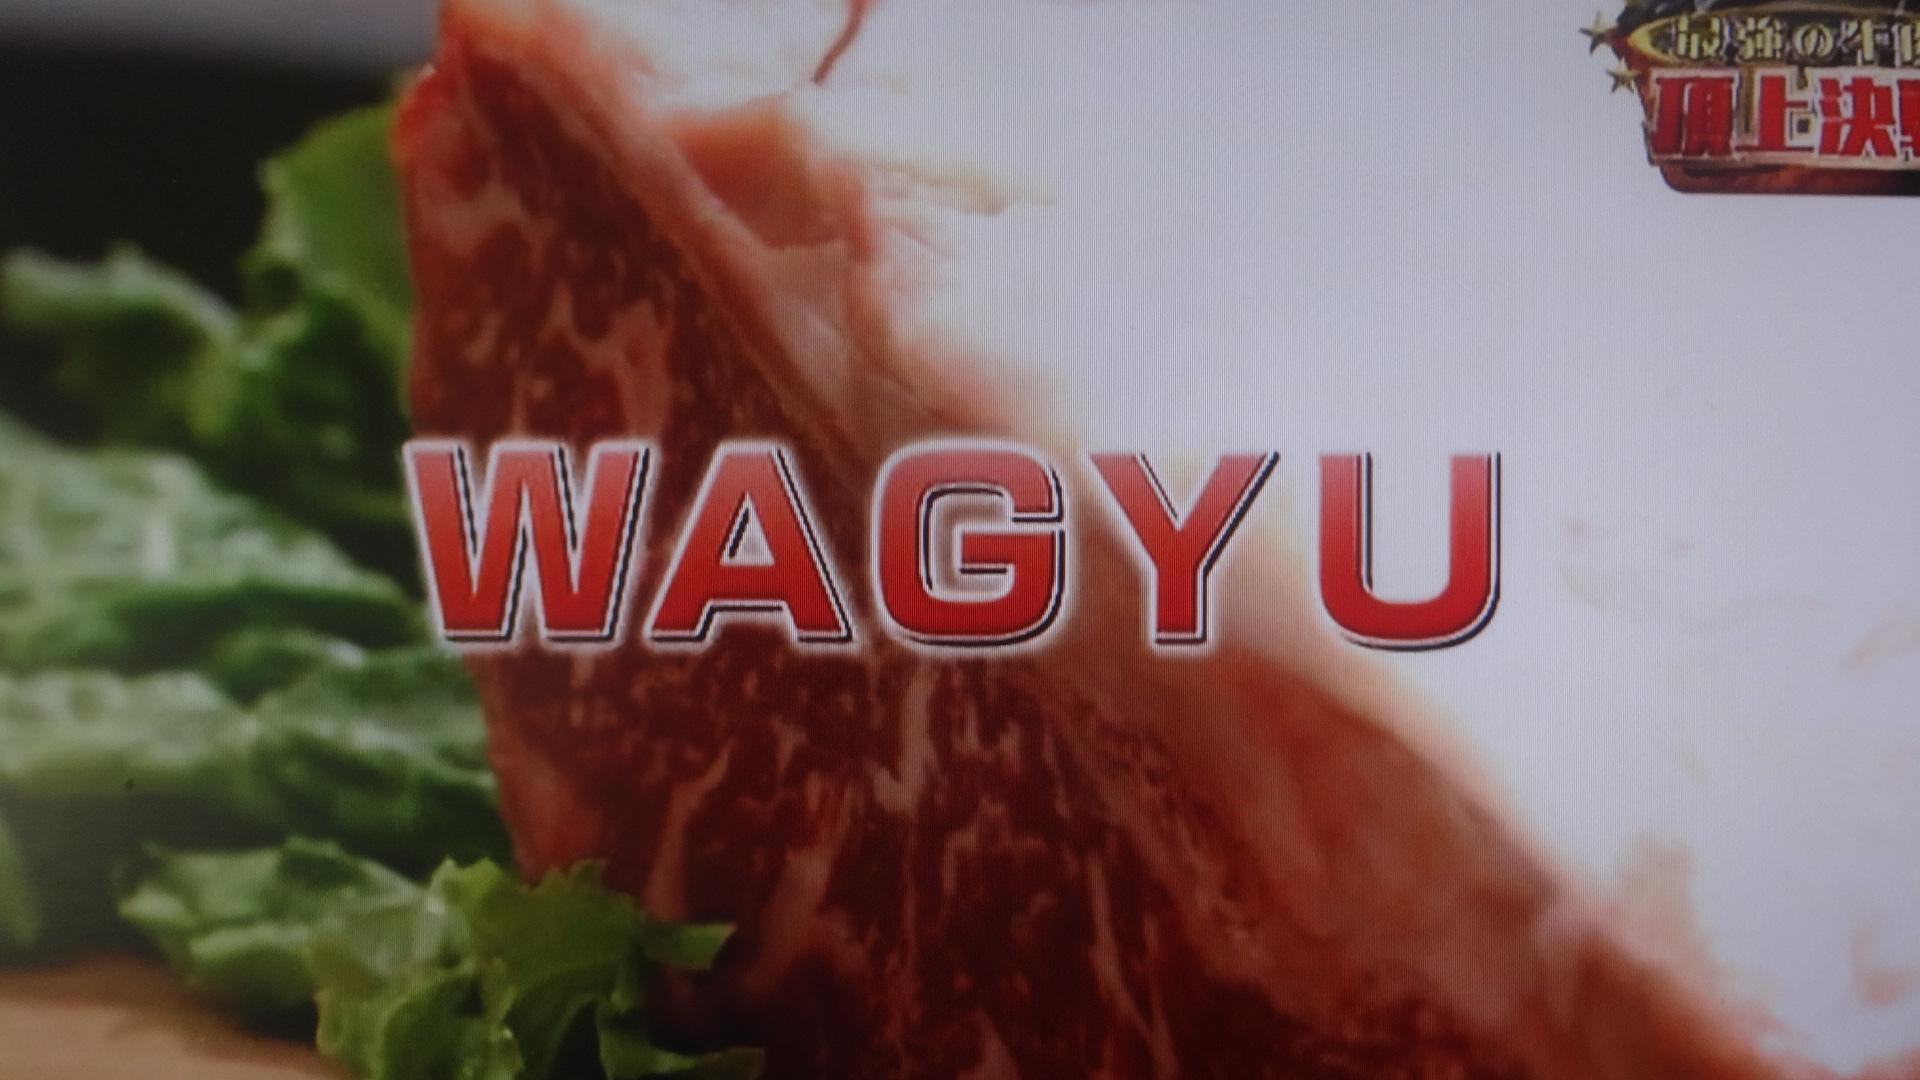 WAGYU番組の画面